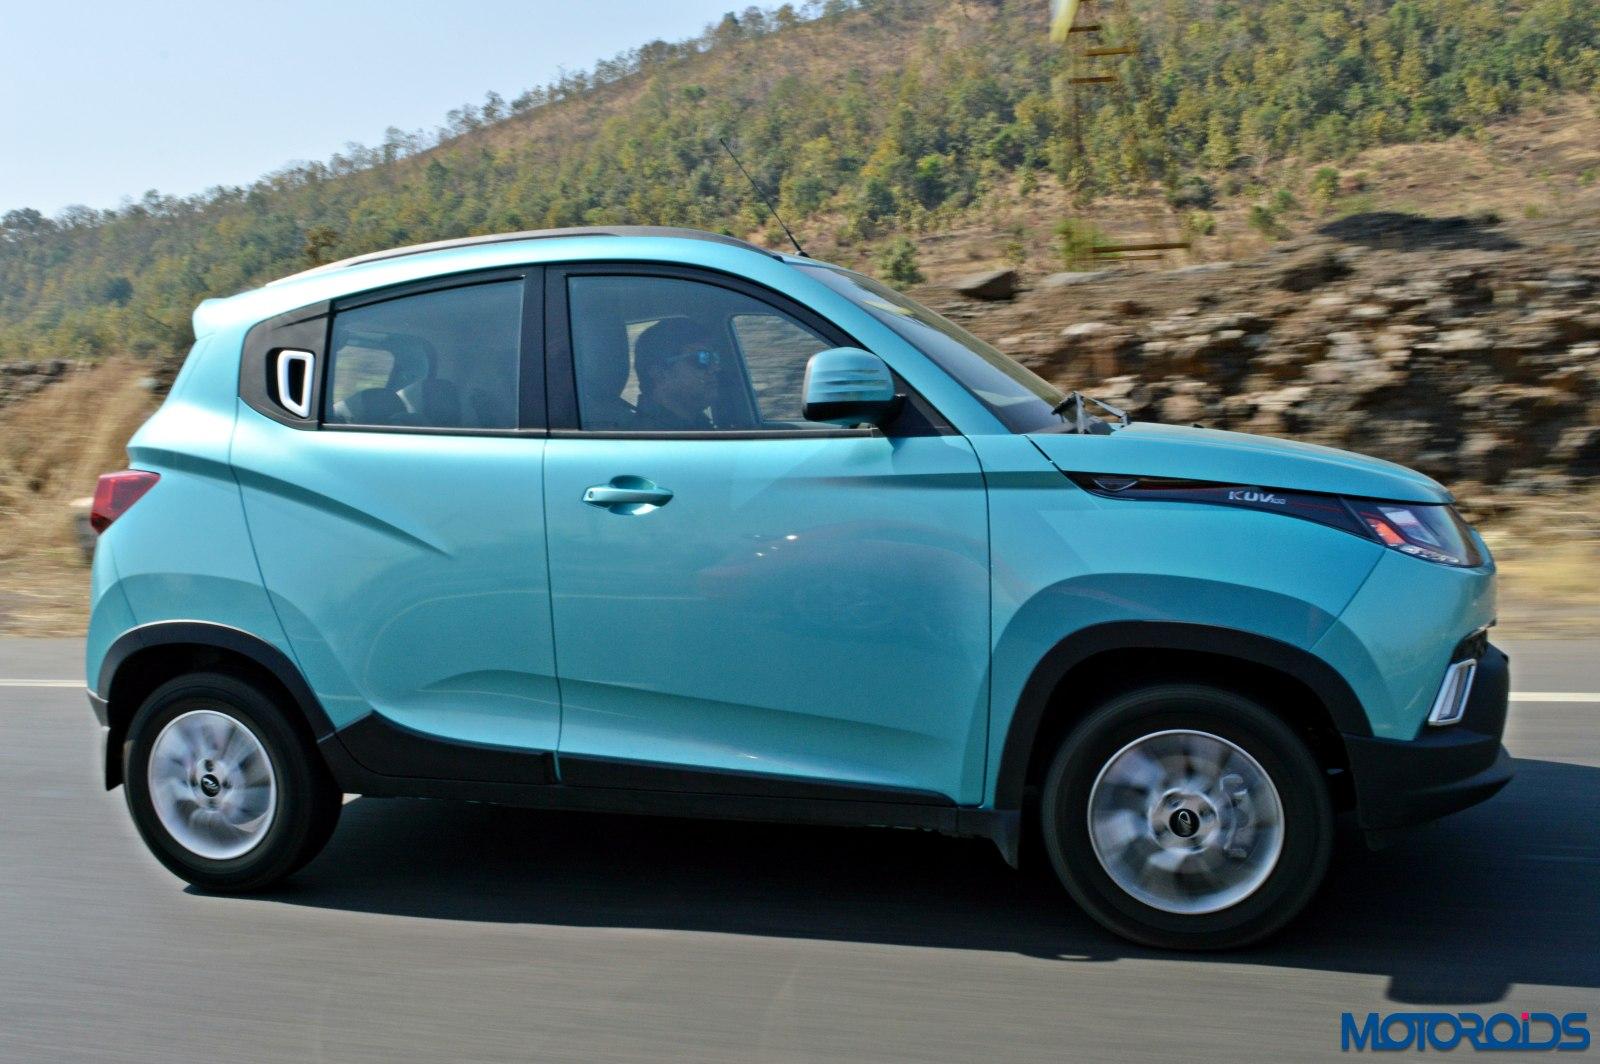 KUV 100 petrol review India